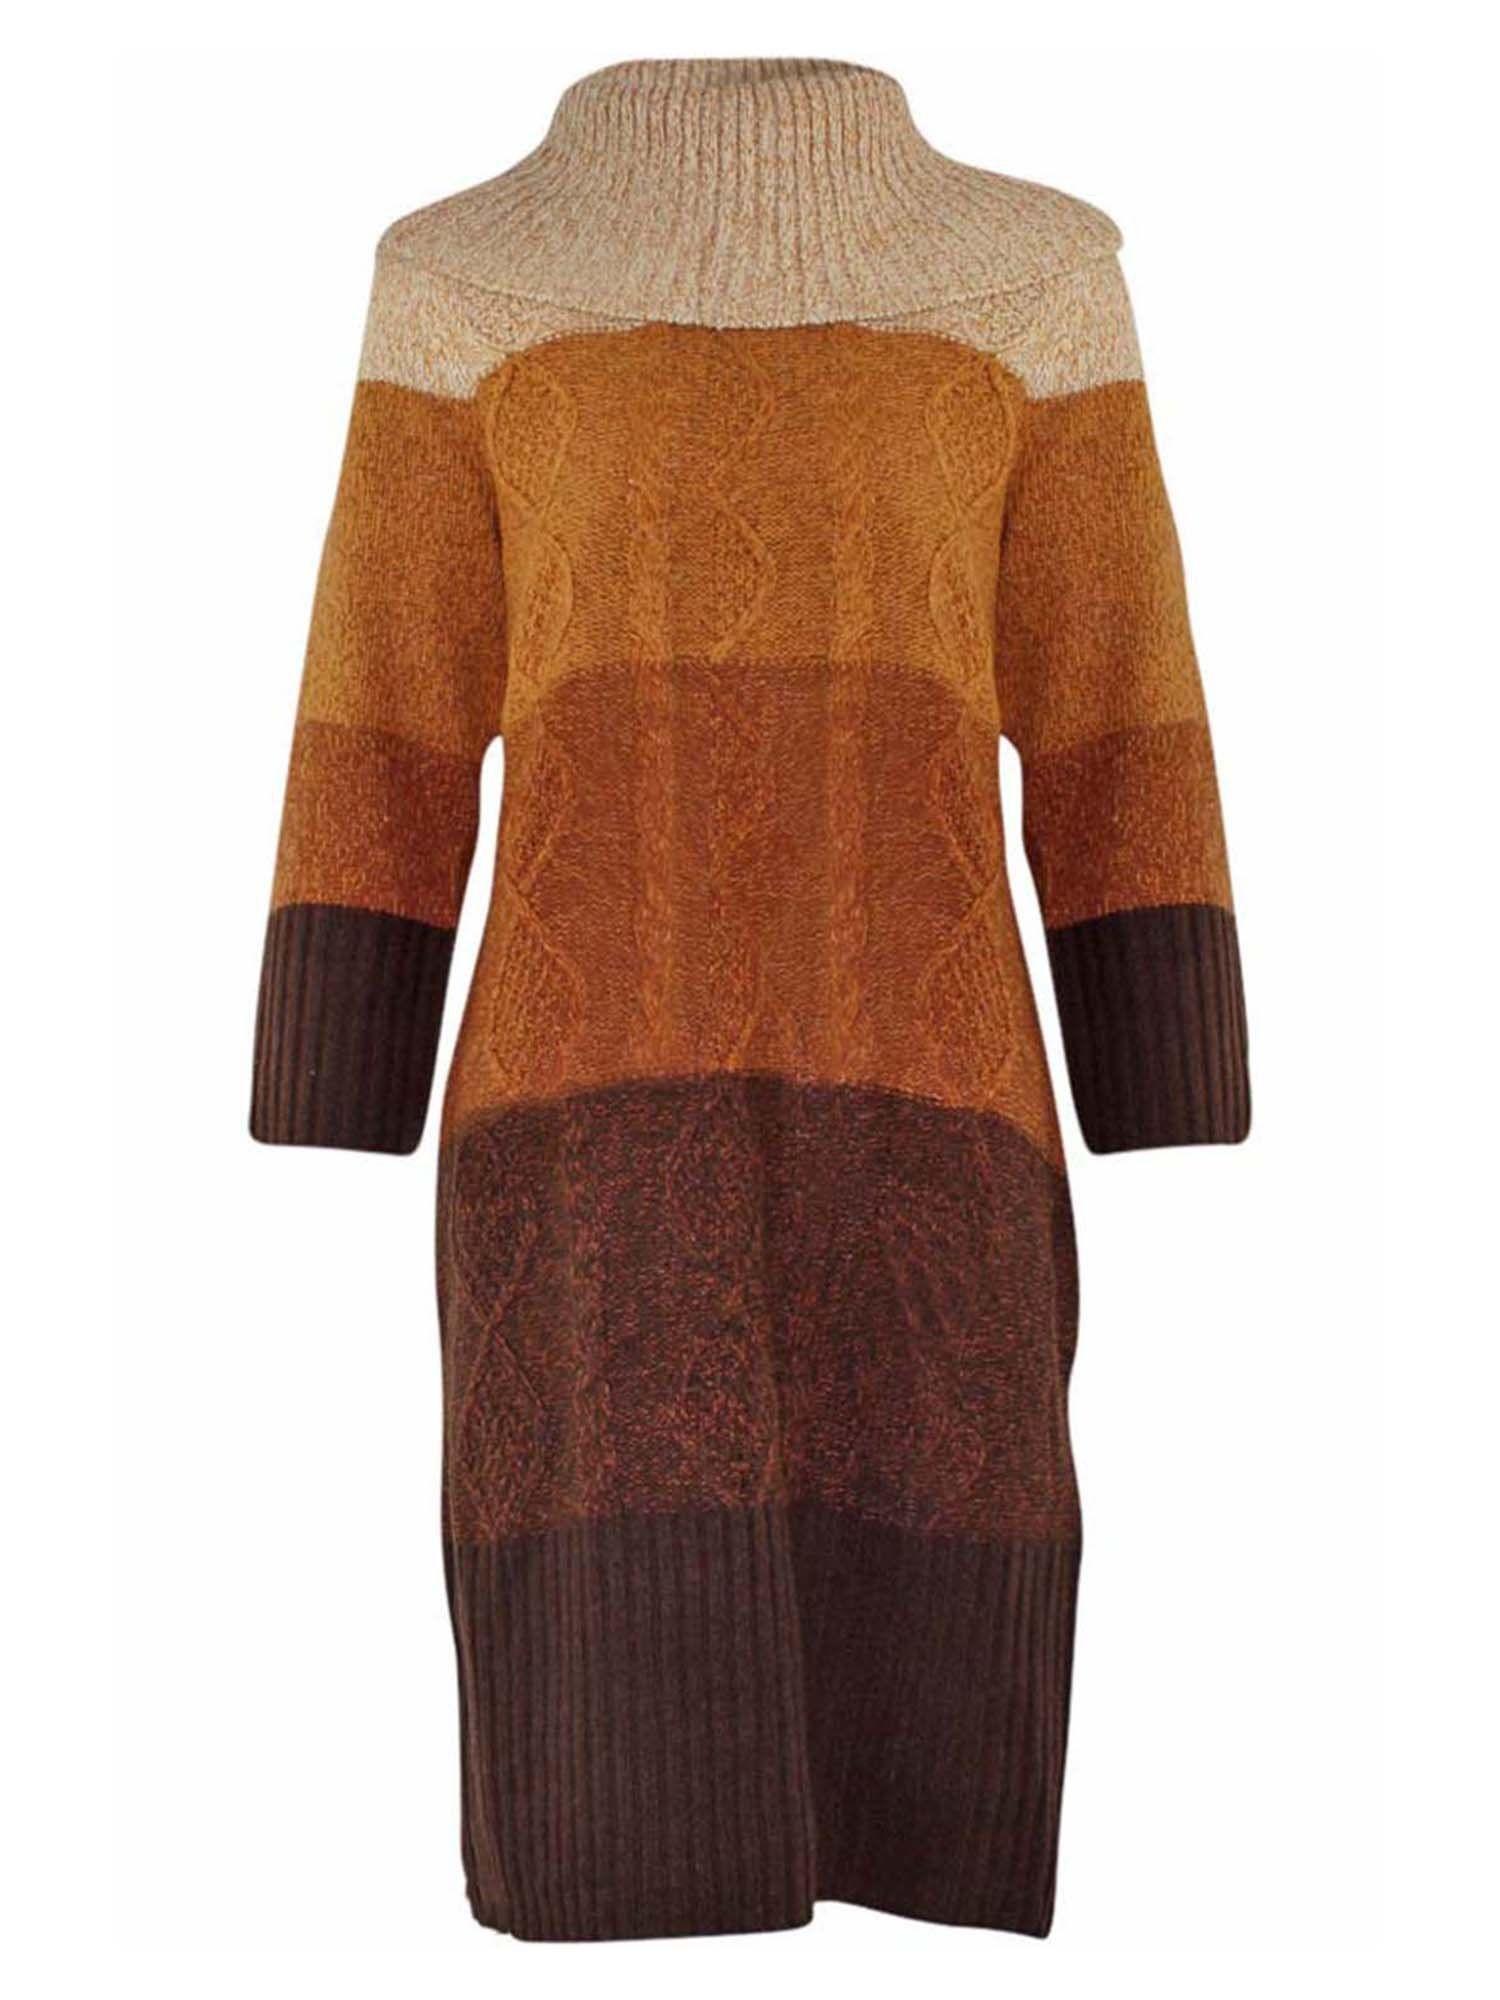 Park Art My WordPress Blog_Cable Knit Sweater Dress Maxi